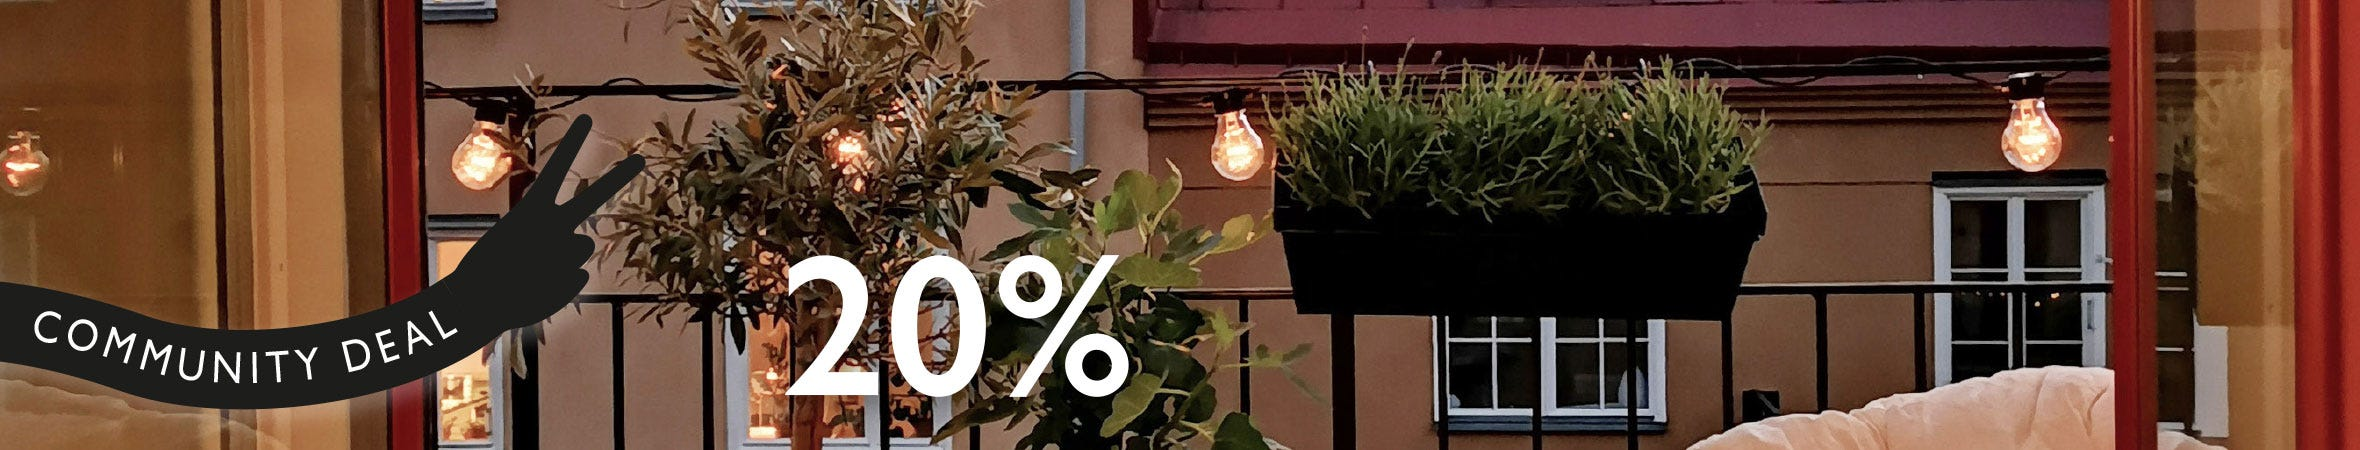 Balkonglåda och kruka zink 20% rabatt